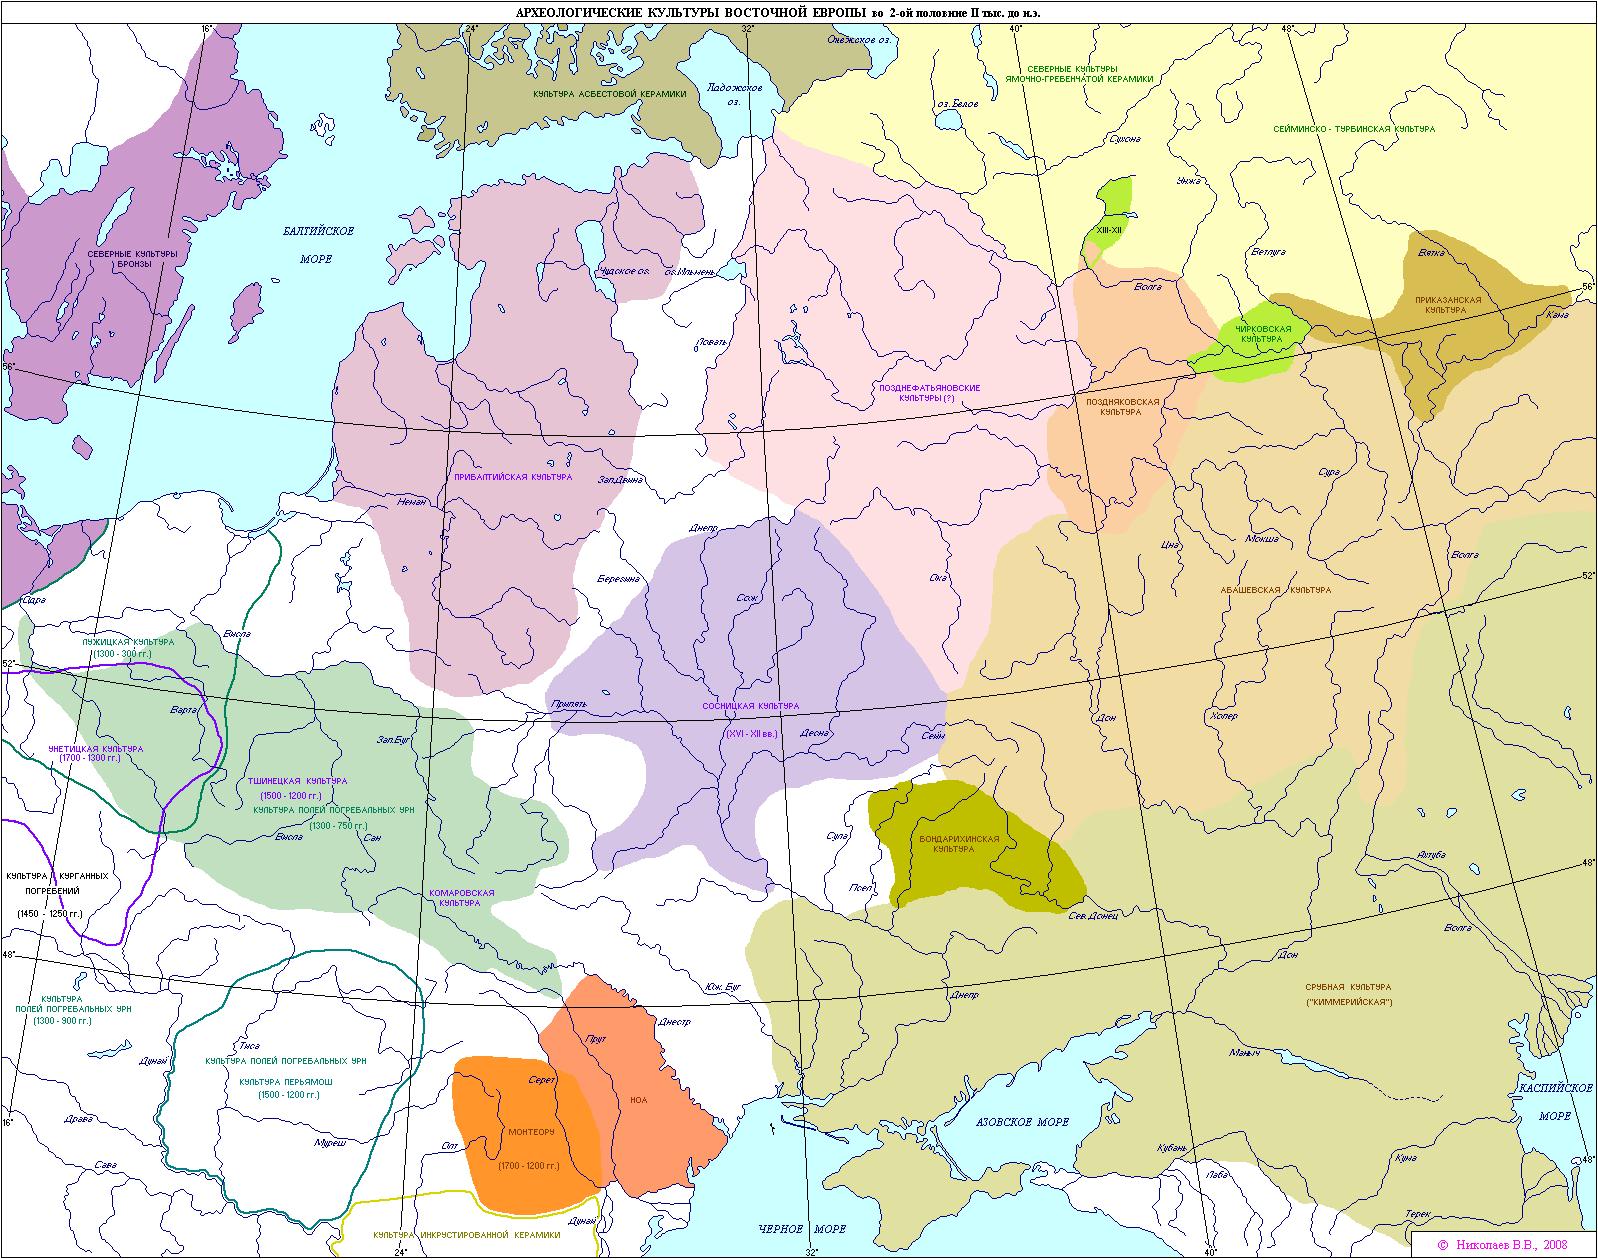 002-europe-1500-1000